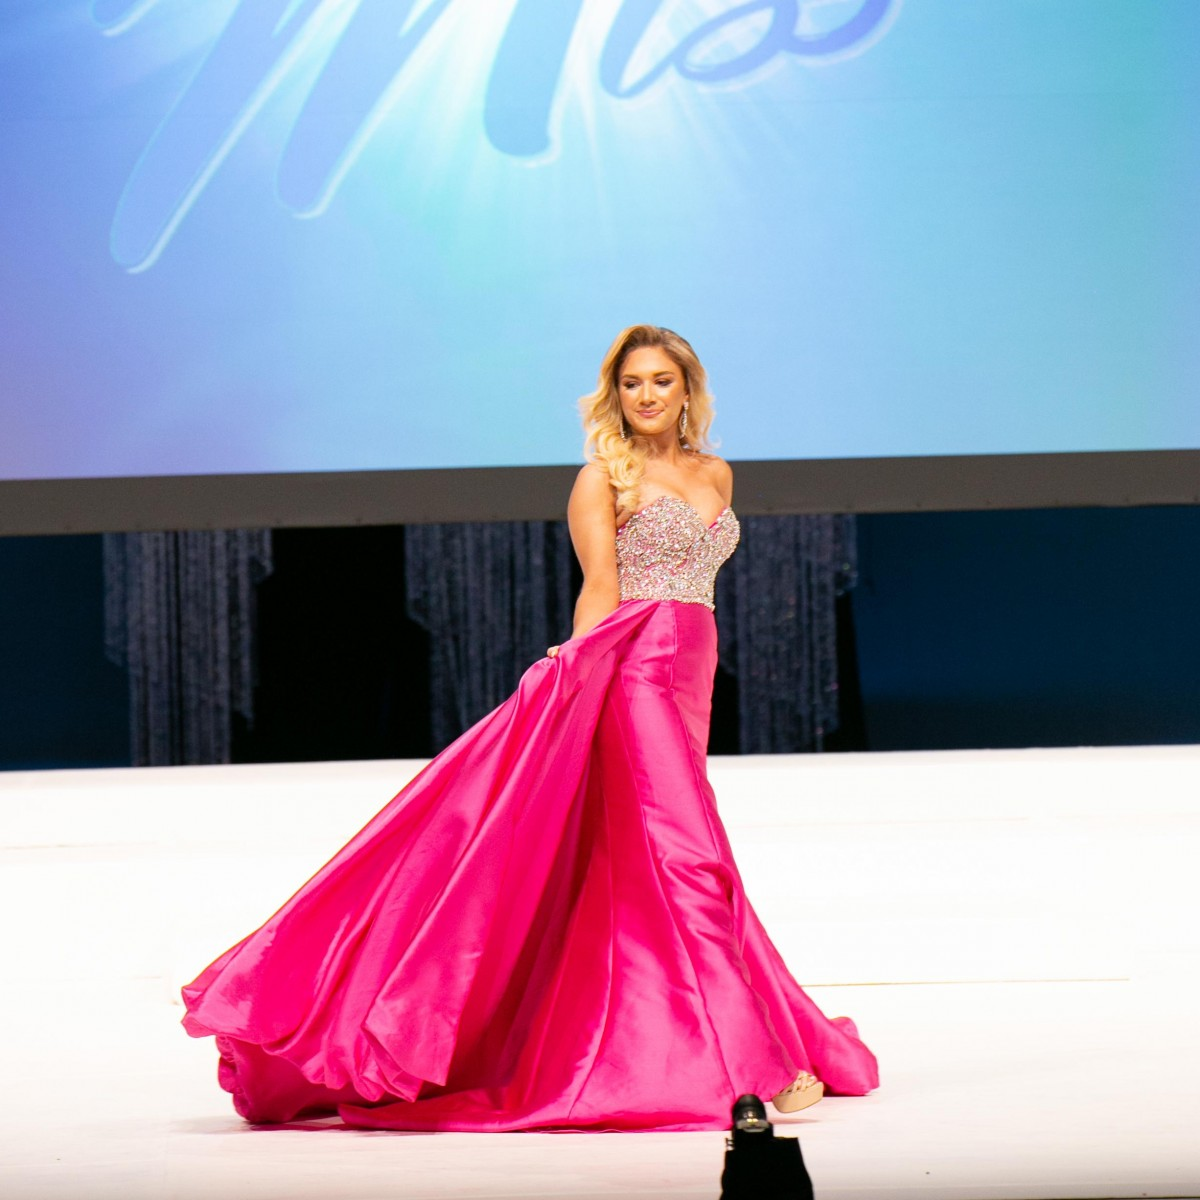 Fuchsia MacDuggal pageant line Dress with overskirt